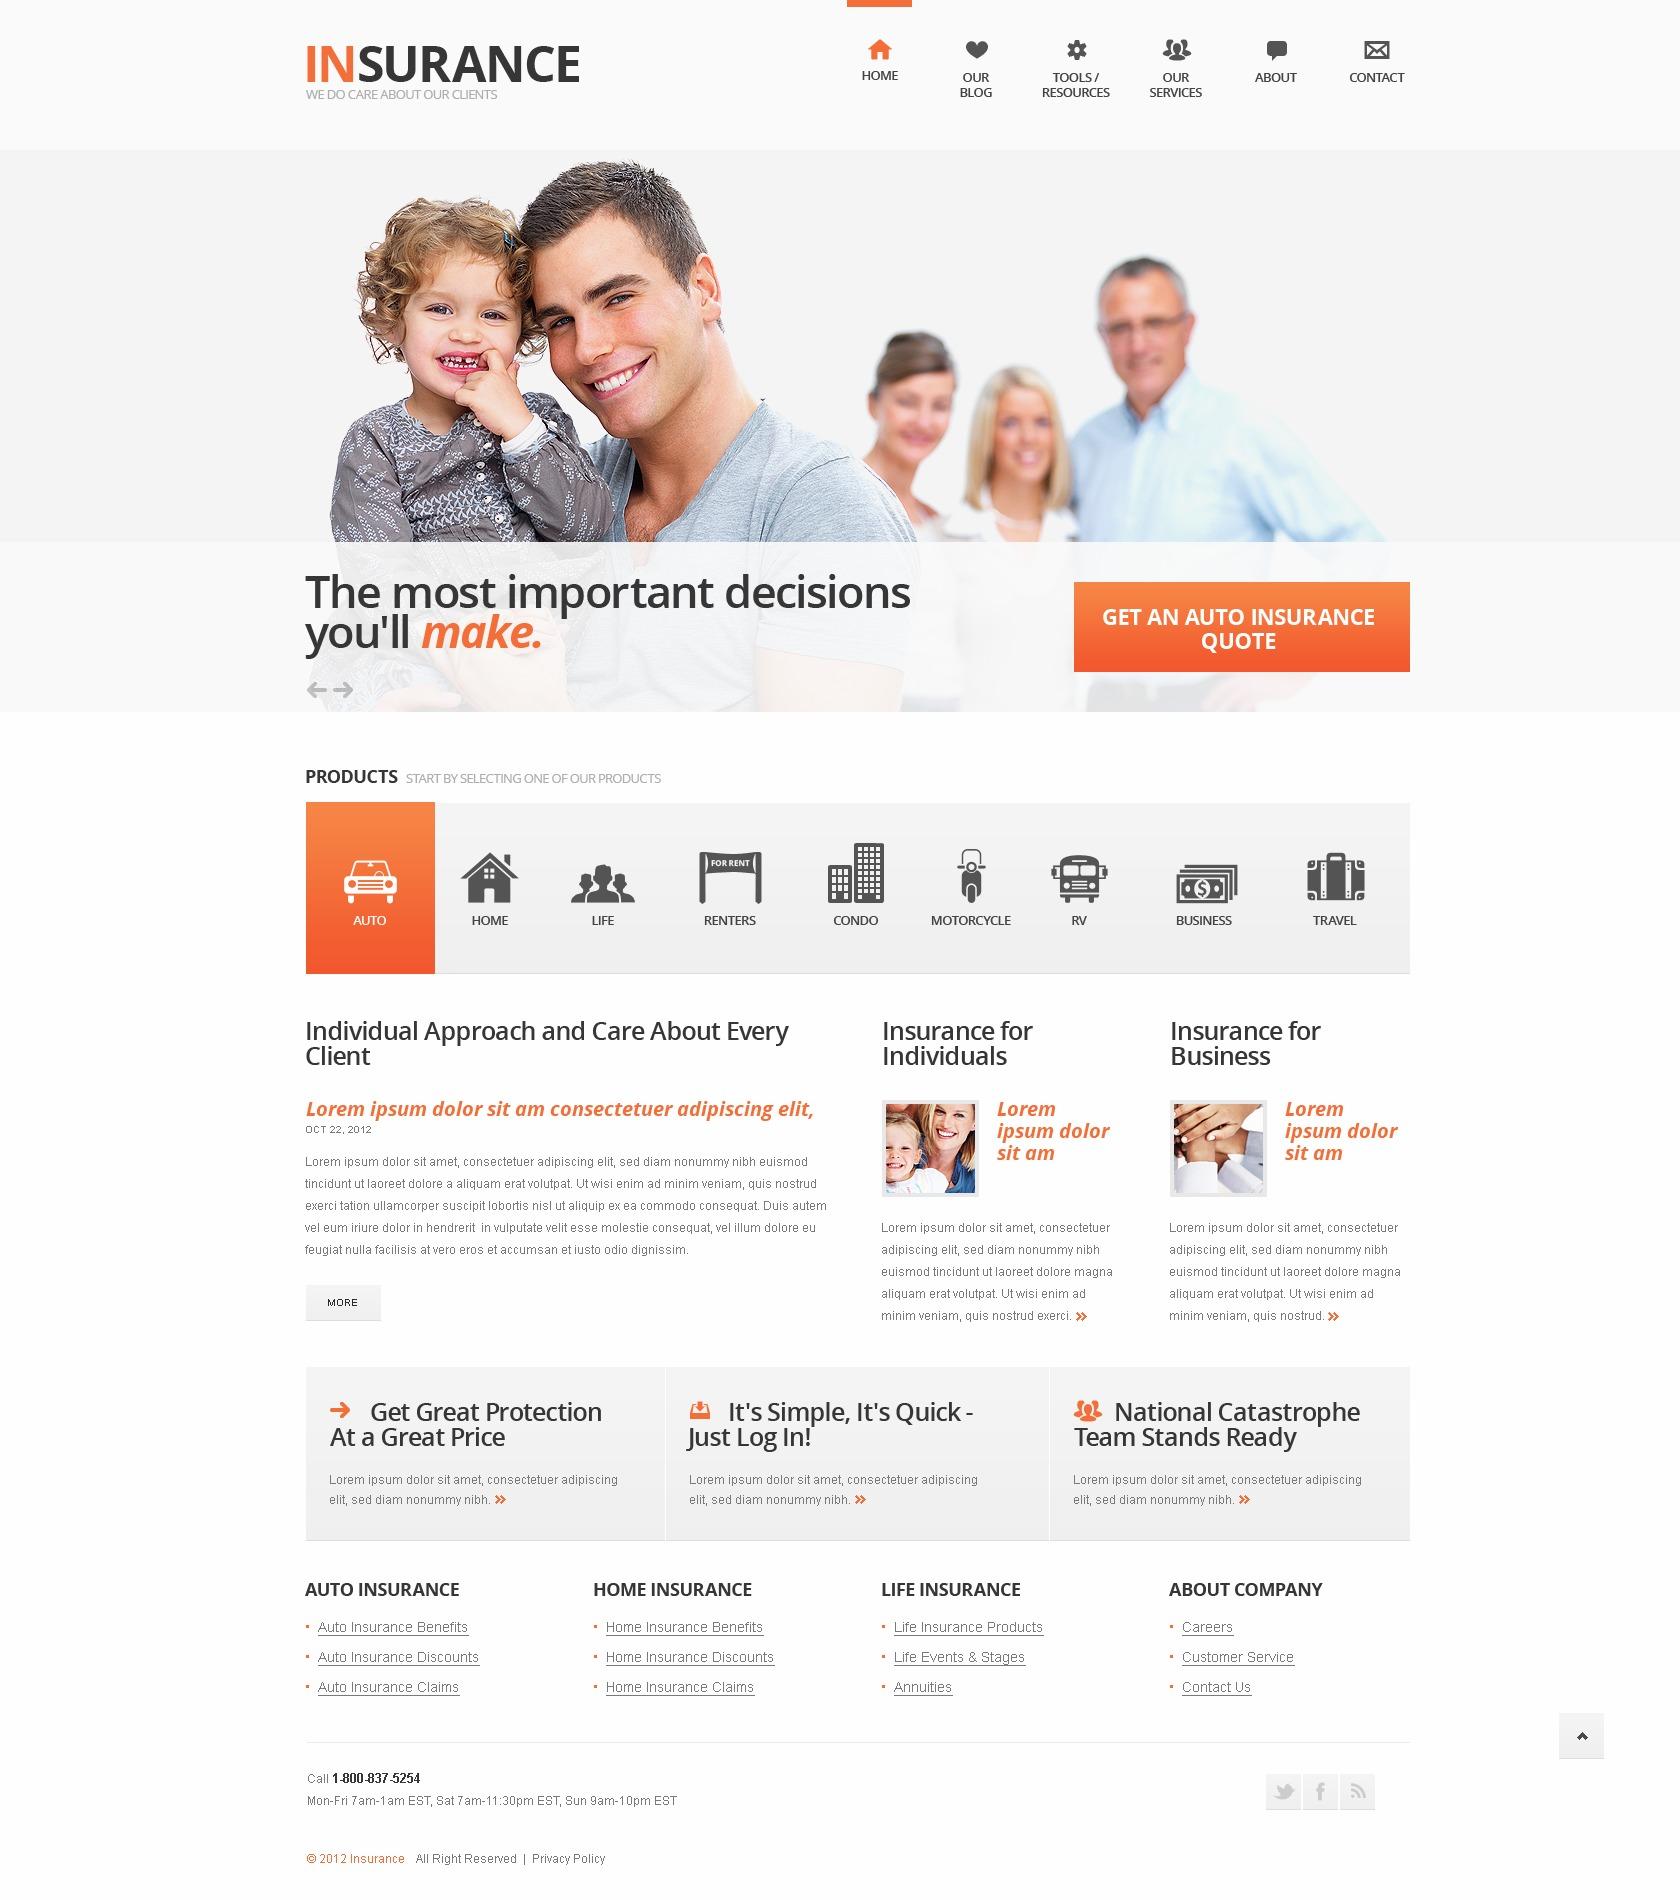 insurance template joomla  joomla insurance template - Hola.klonec.co